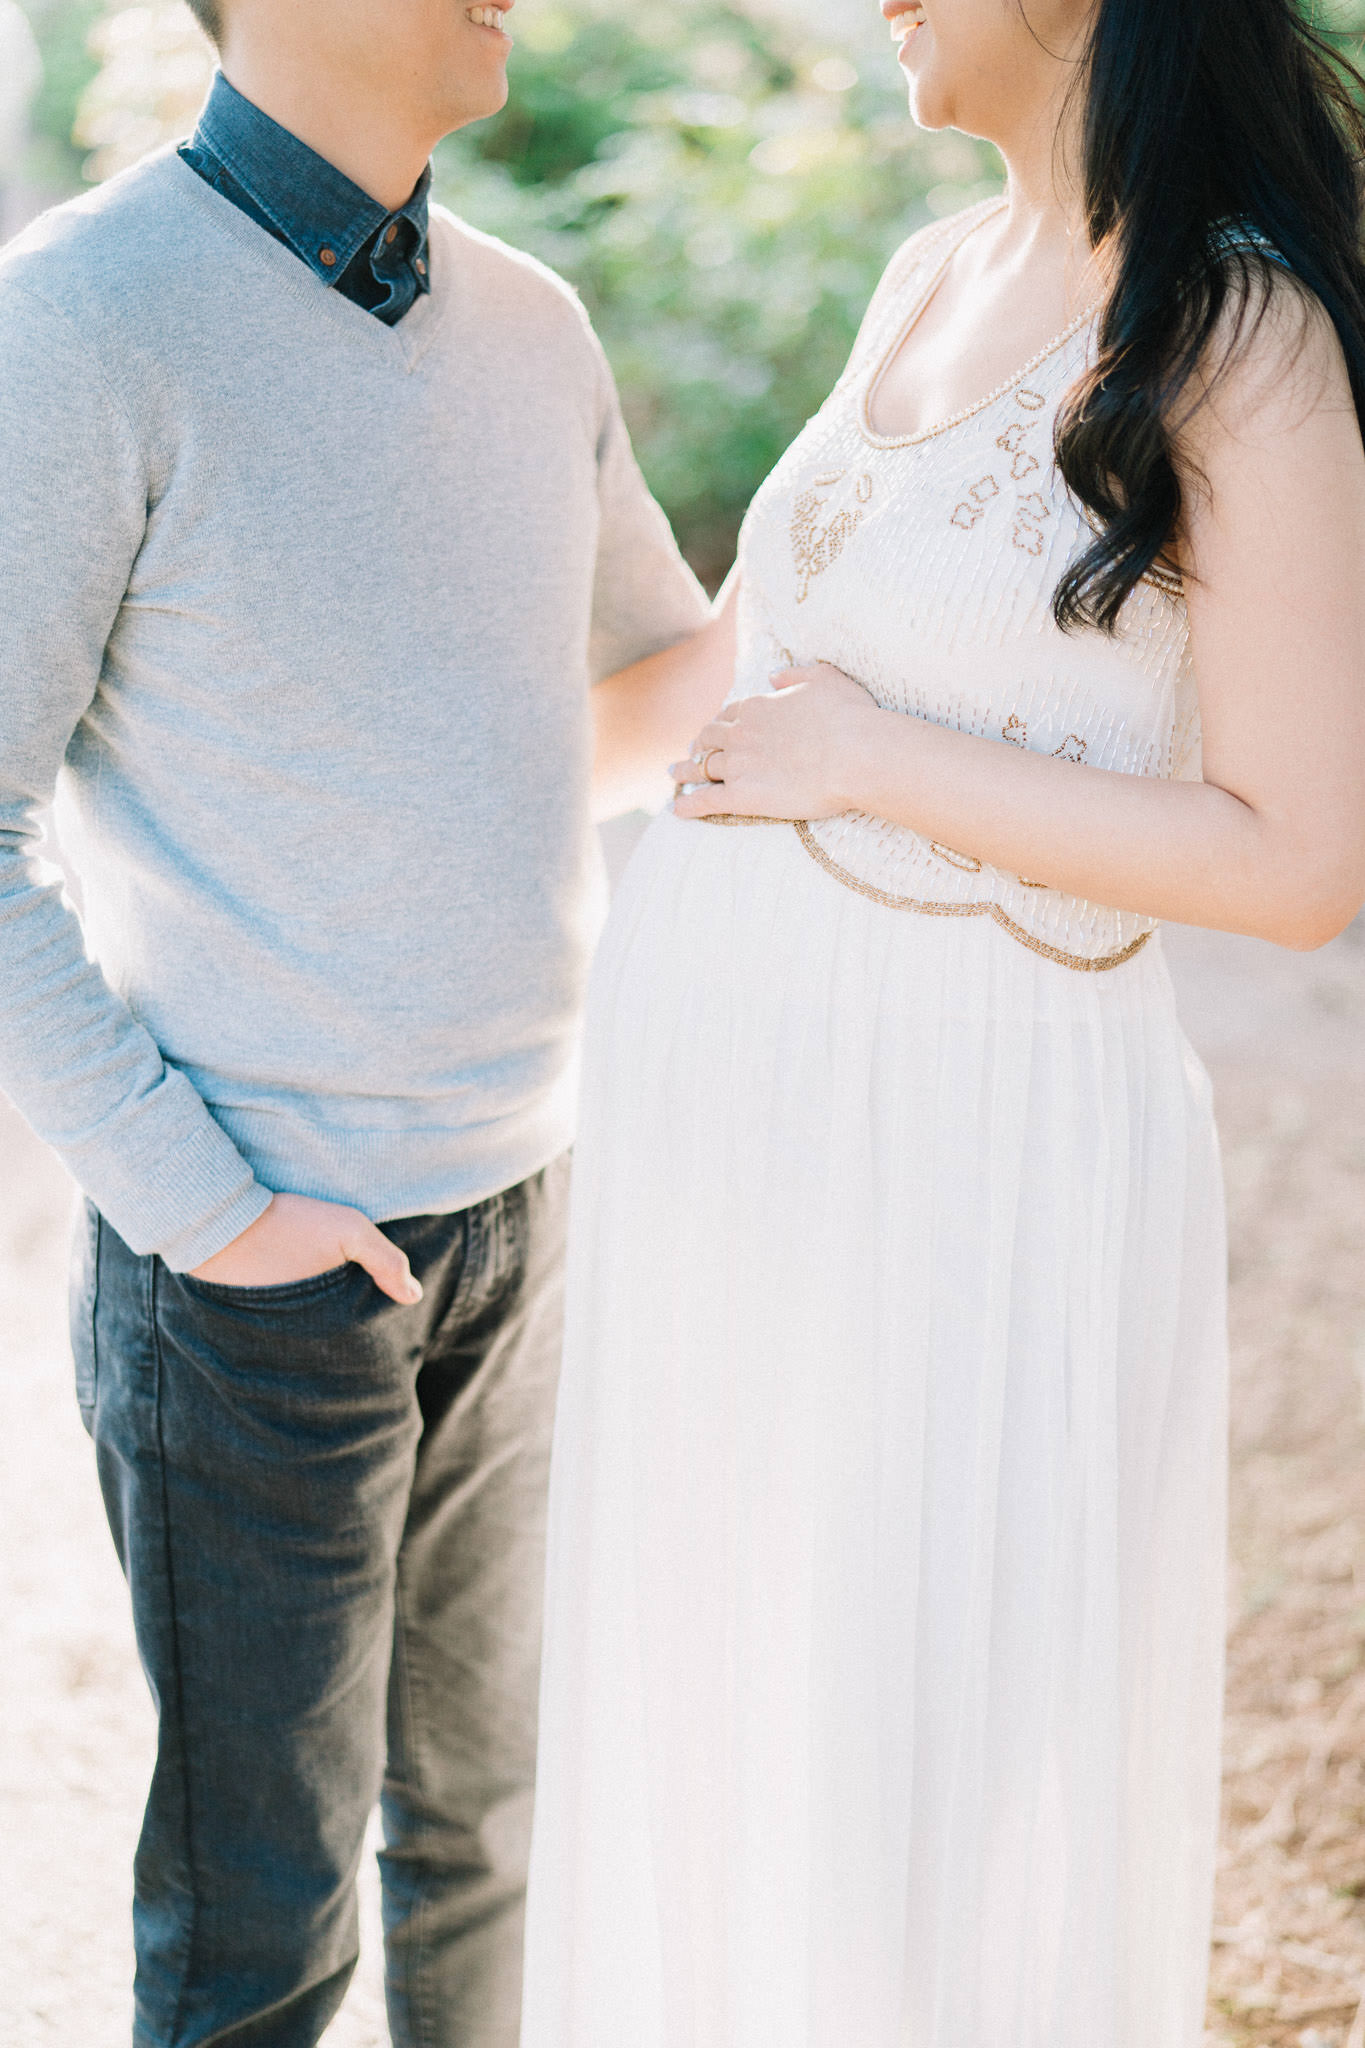 vancouver-maternity-photography-003.jpg